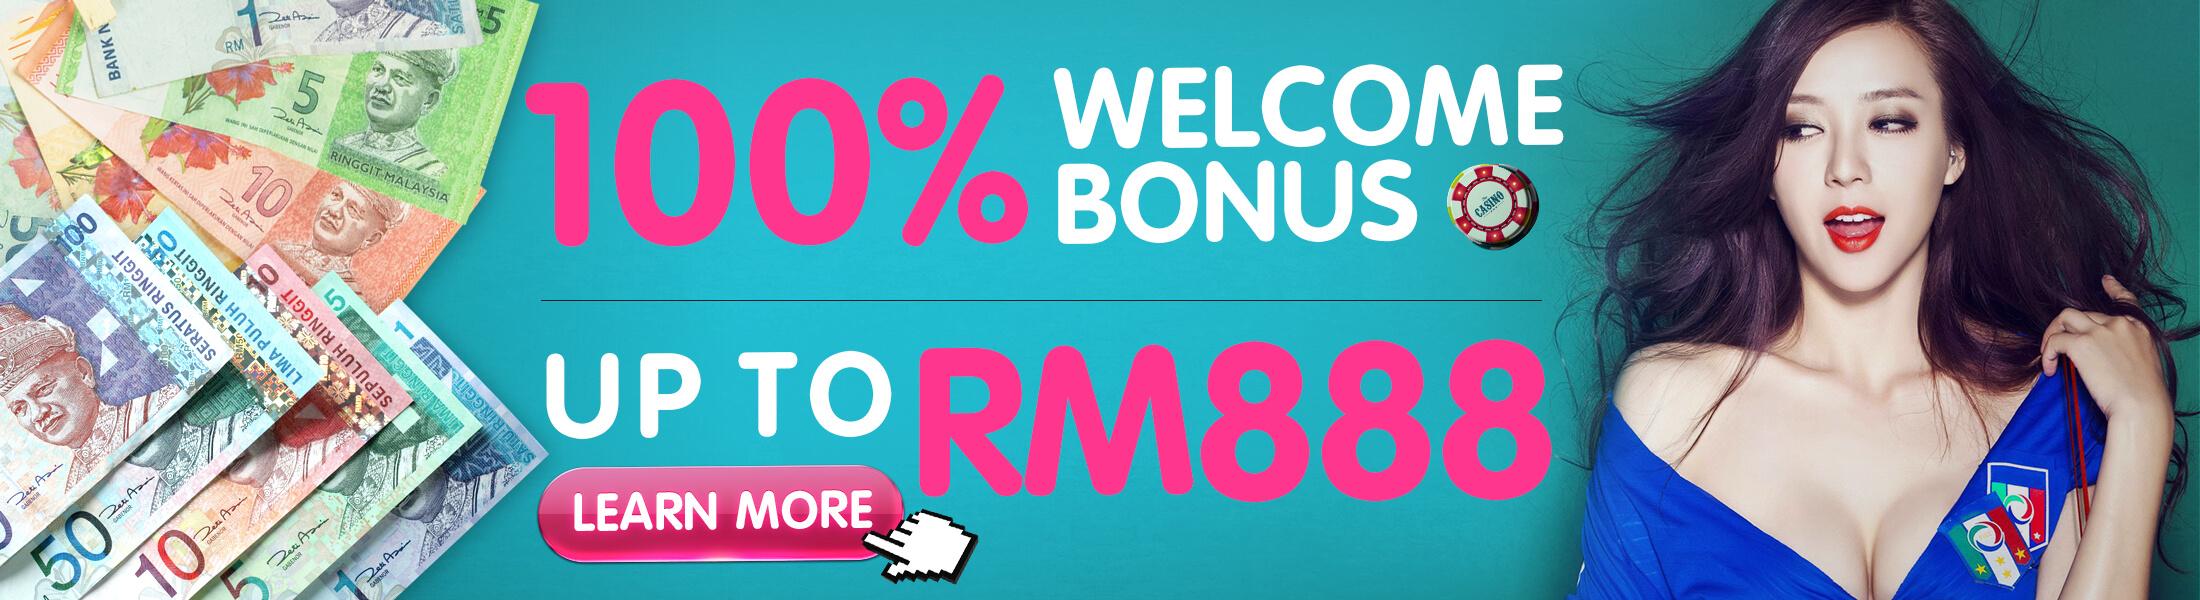 Casino Malaysia Welcome Bonus up to RM888